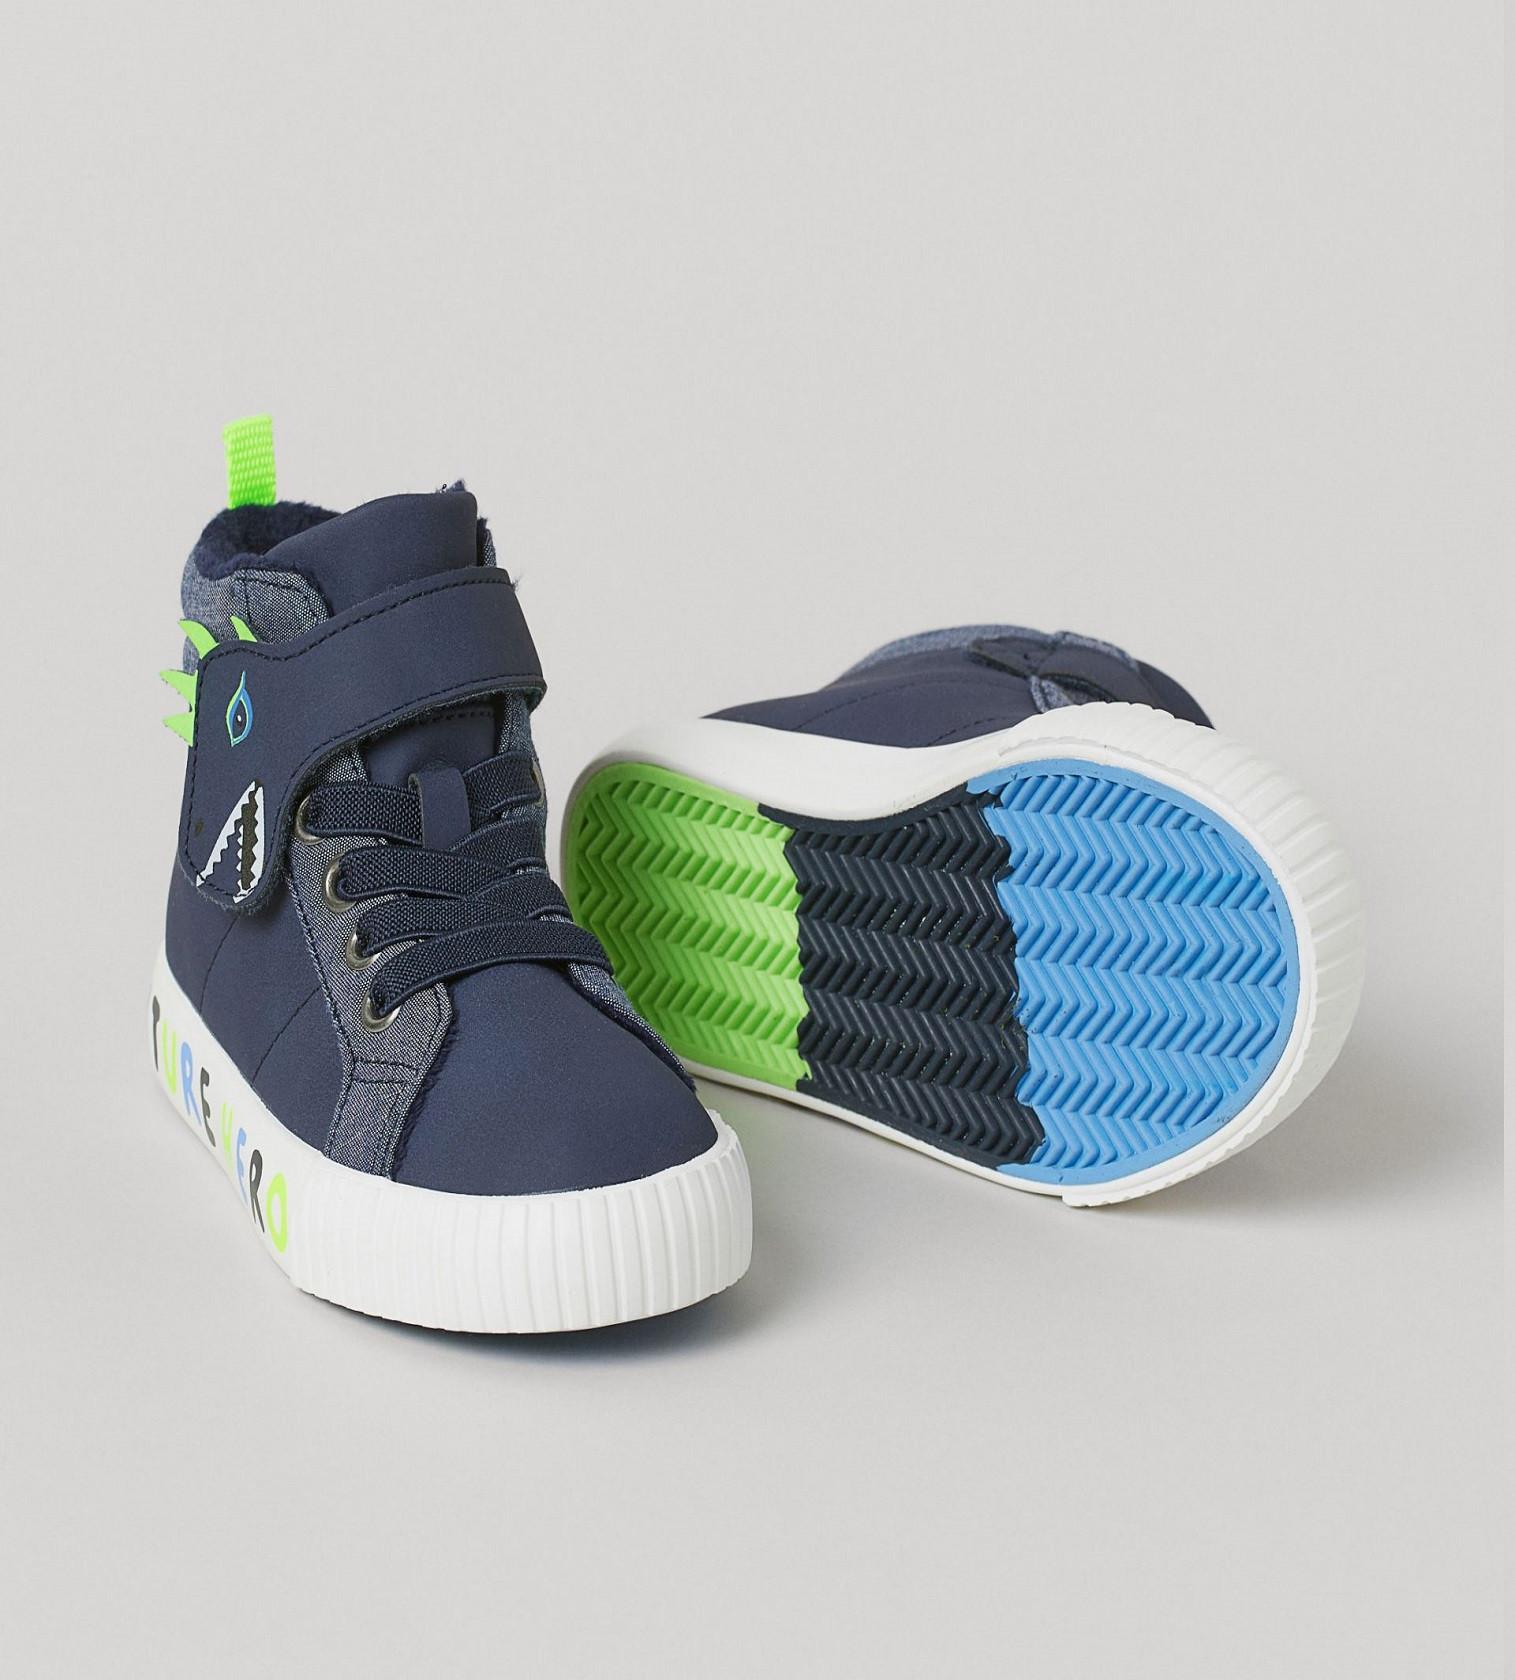 Купити Хайтопи кеди H&M Blue/Future Hero - фото 1